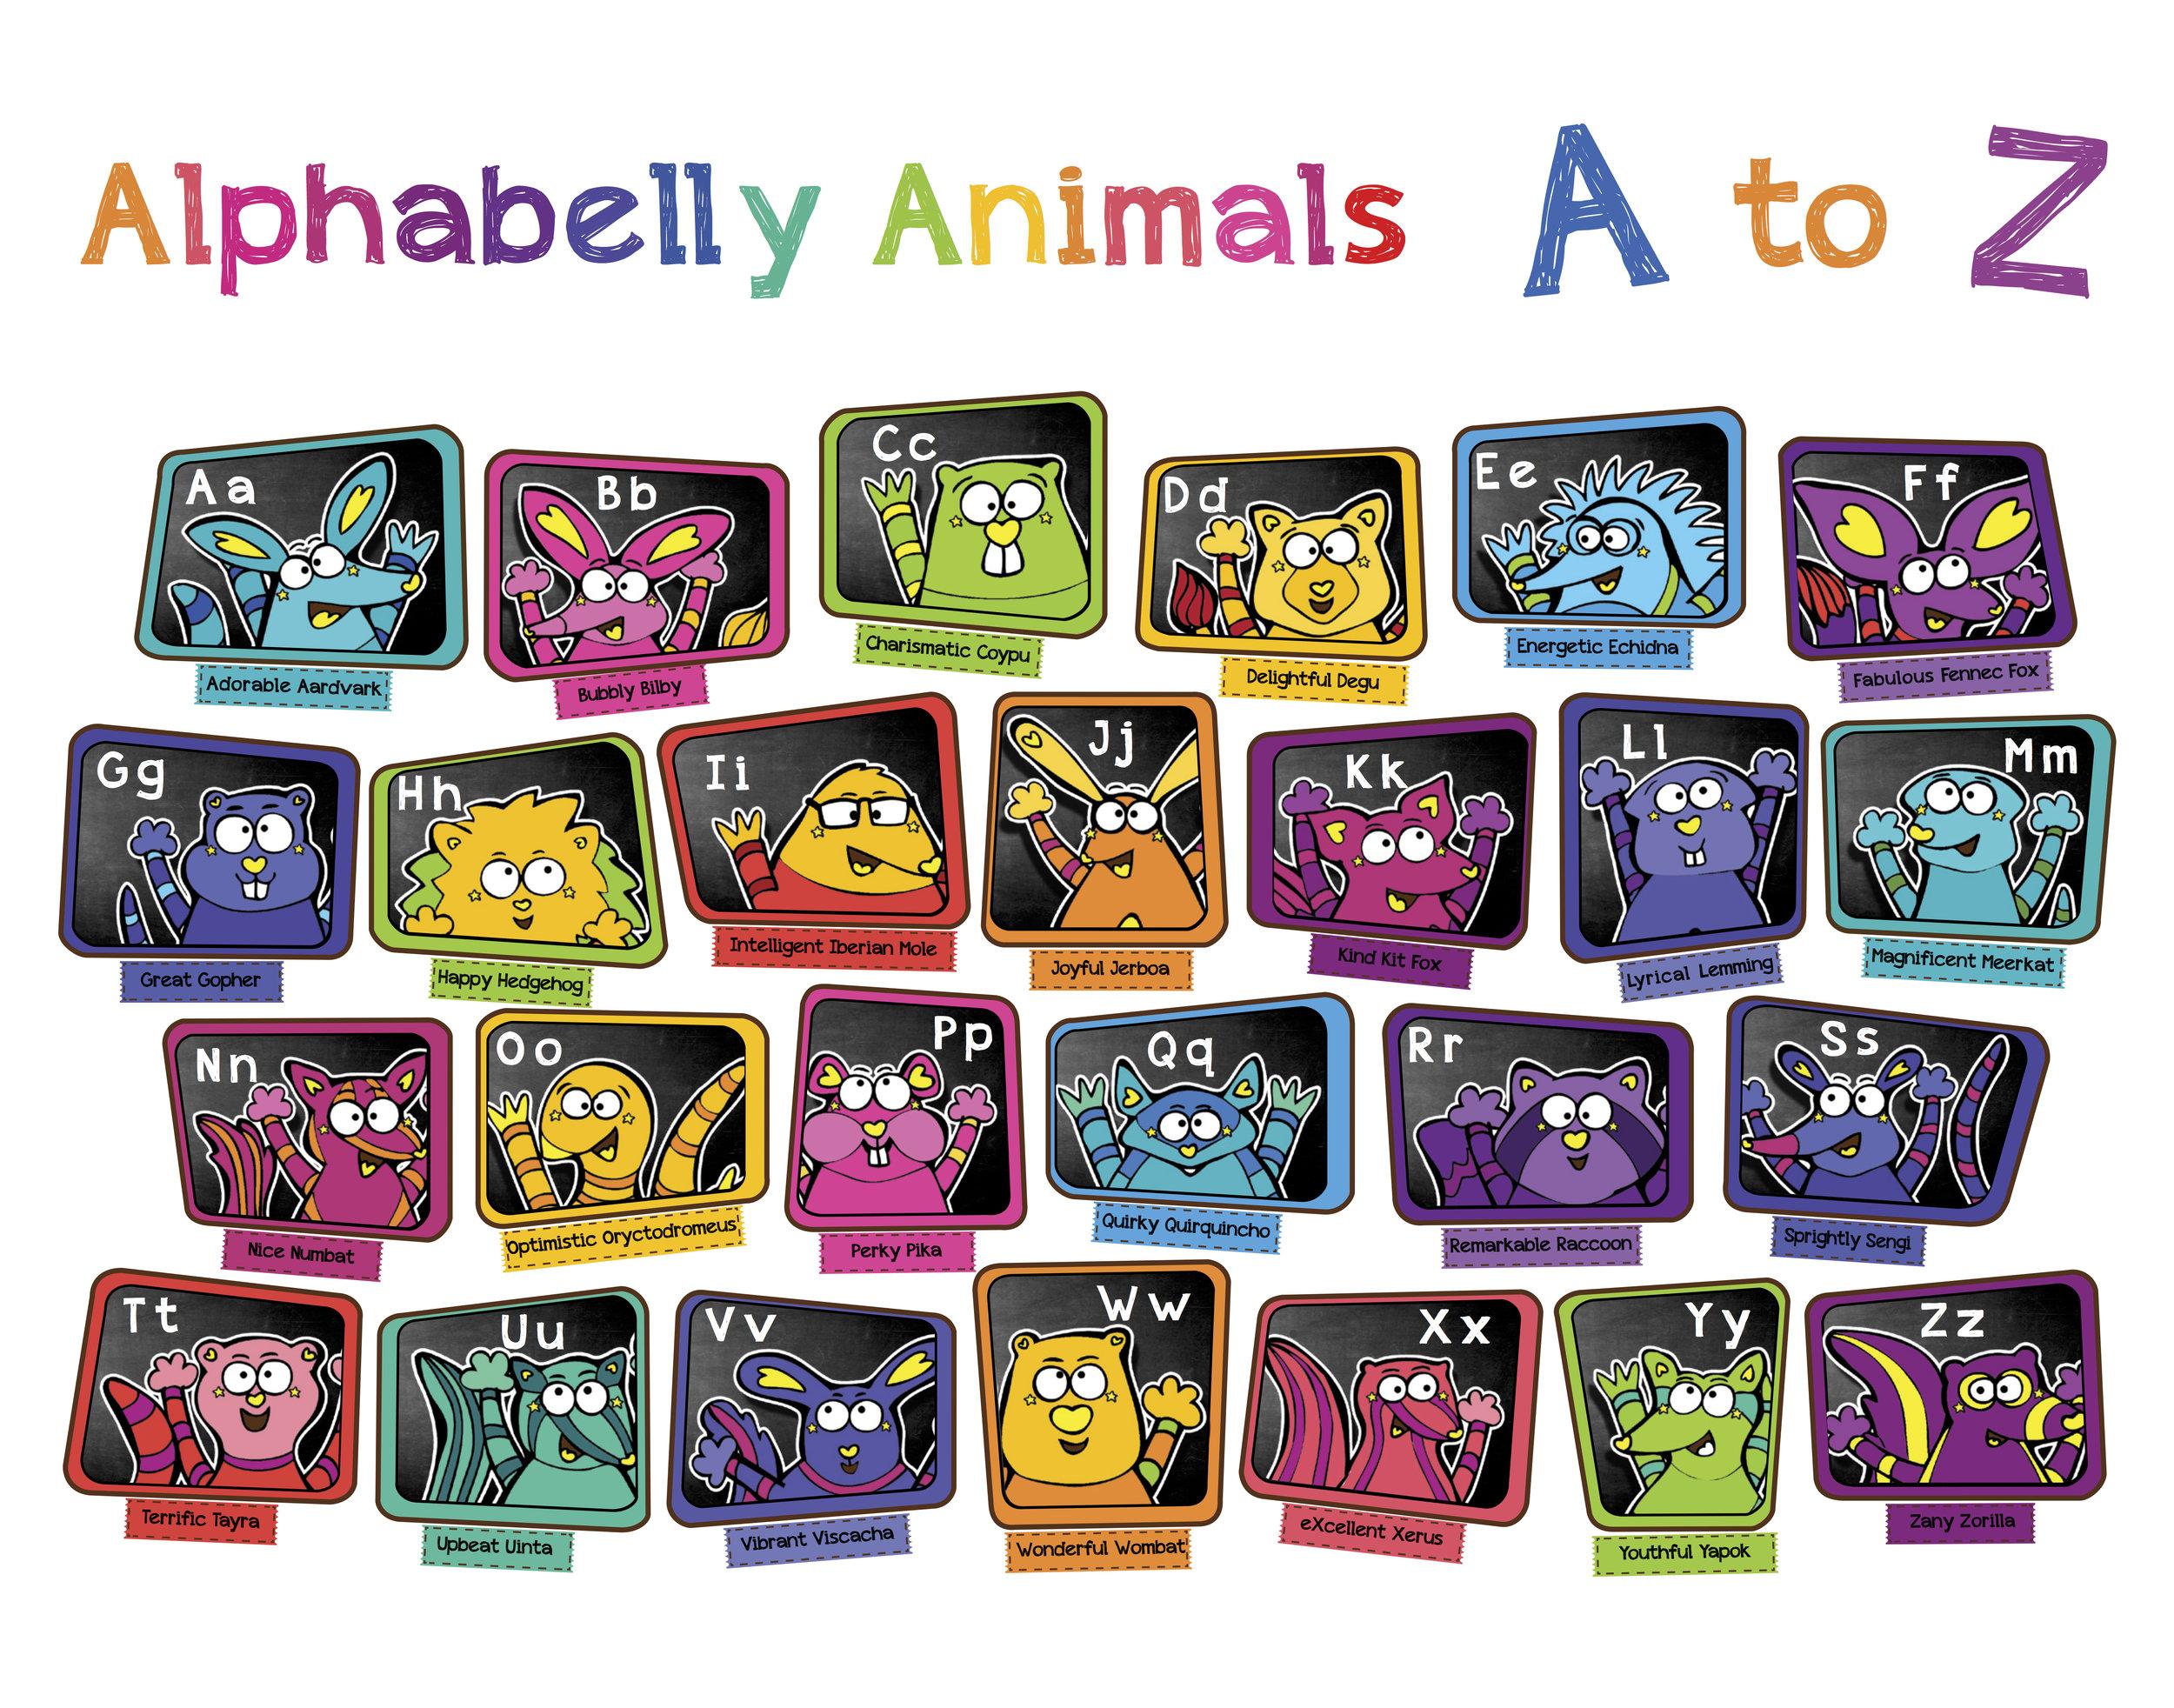 KiKi Han-KiKiHan-GeekyKiKi-Geeky KiKi-Missgeekykiki-Cutiecons-Cutiecon-Cutie Con-Alphabellies-Alphabelly-A to Z Animal Poster